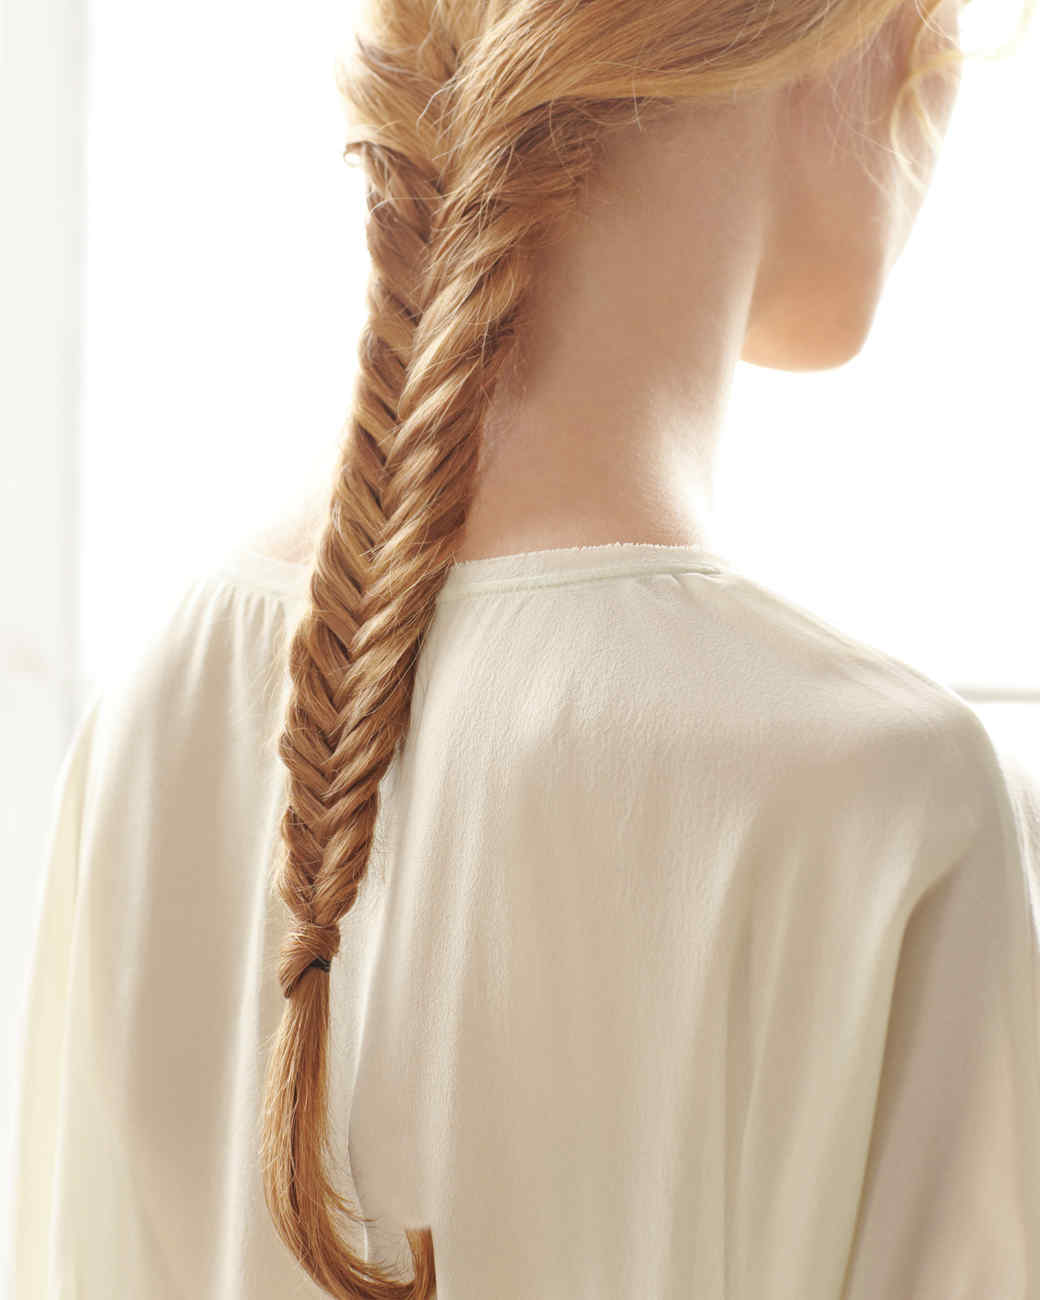 braids-fishtail-md10882.jpg